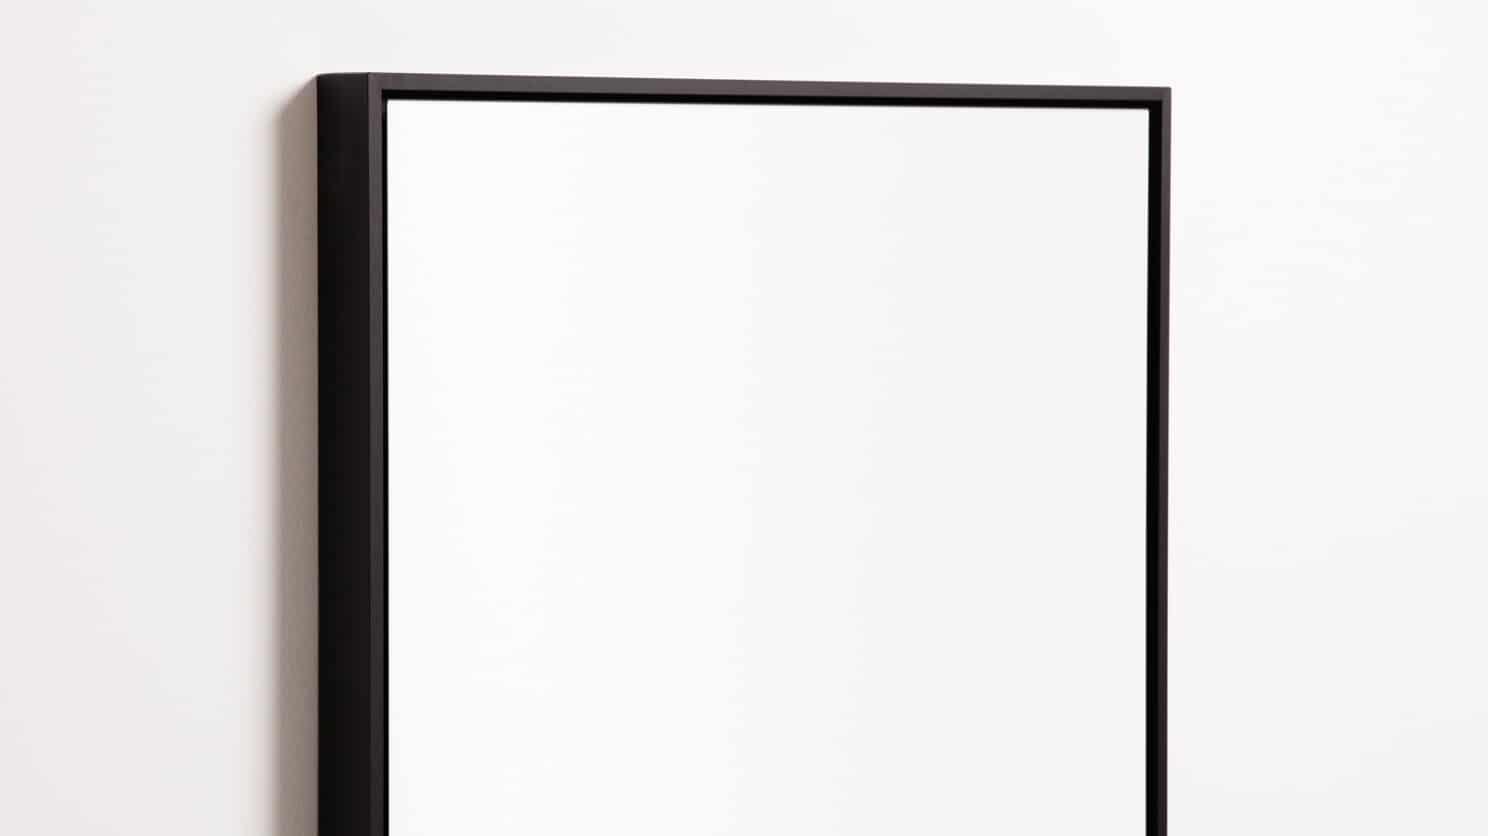 3130 044 1 2 mirror spy square black detail